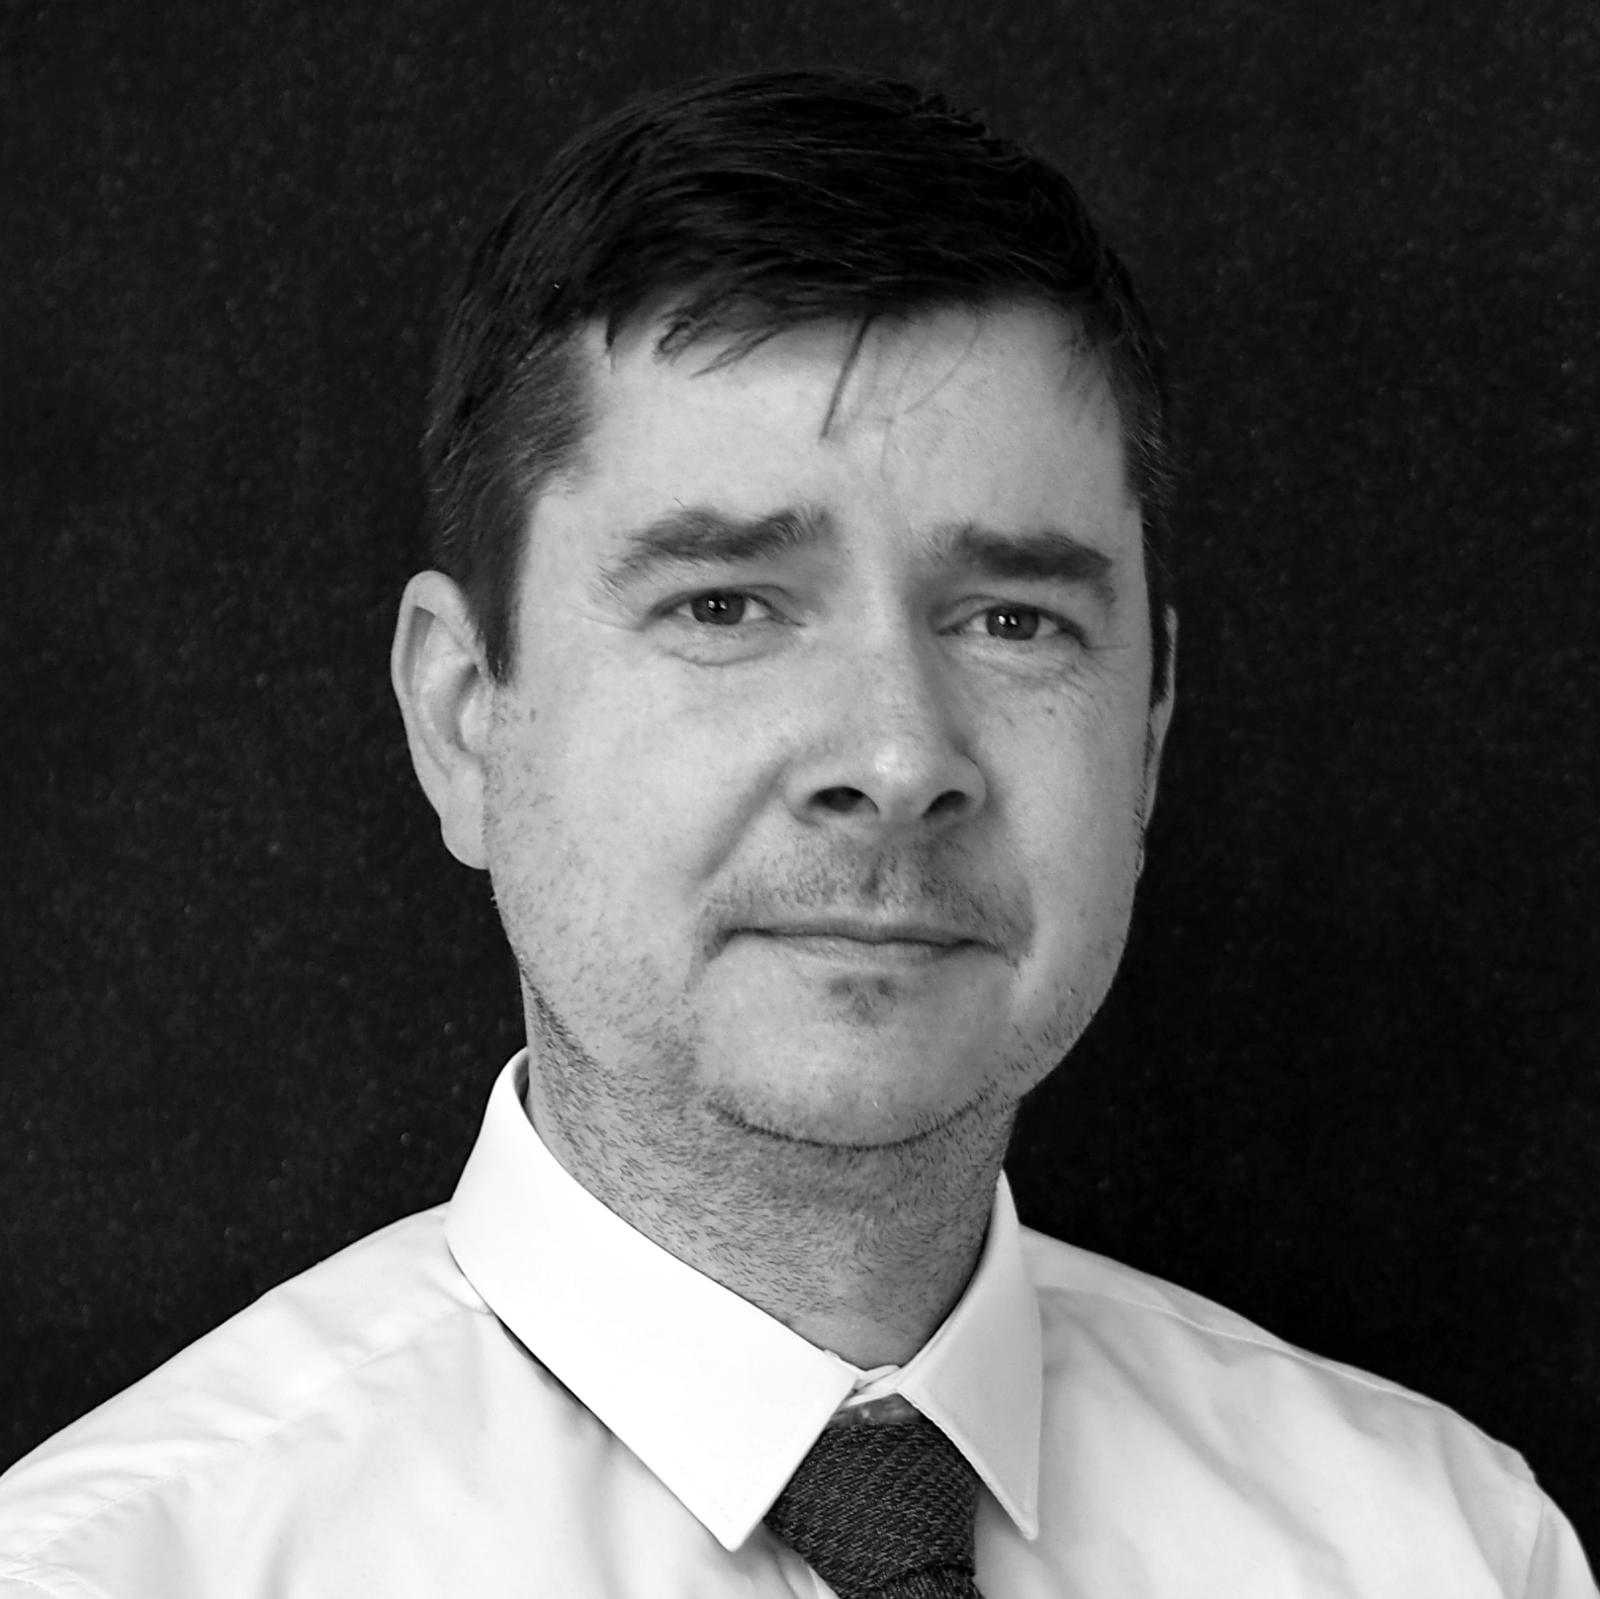 Kristján Valur Jónsson